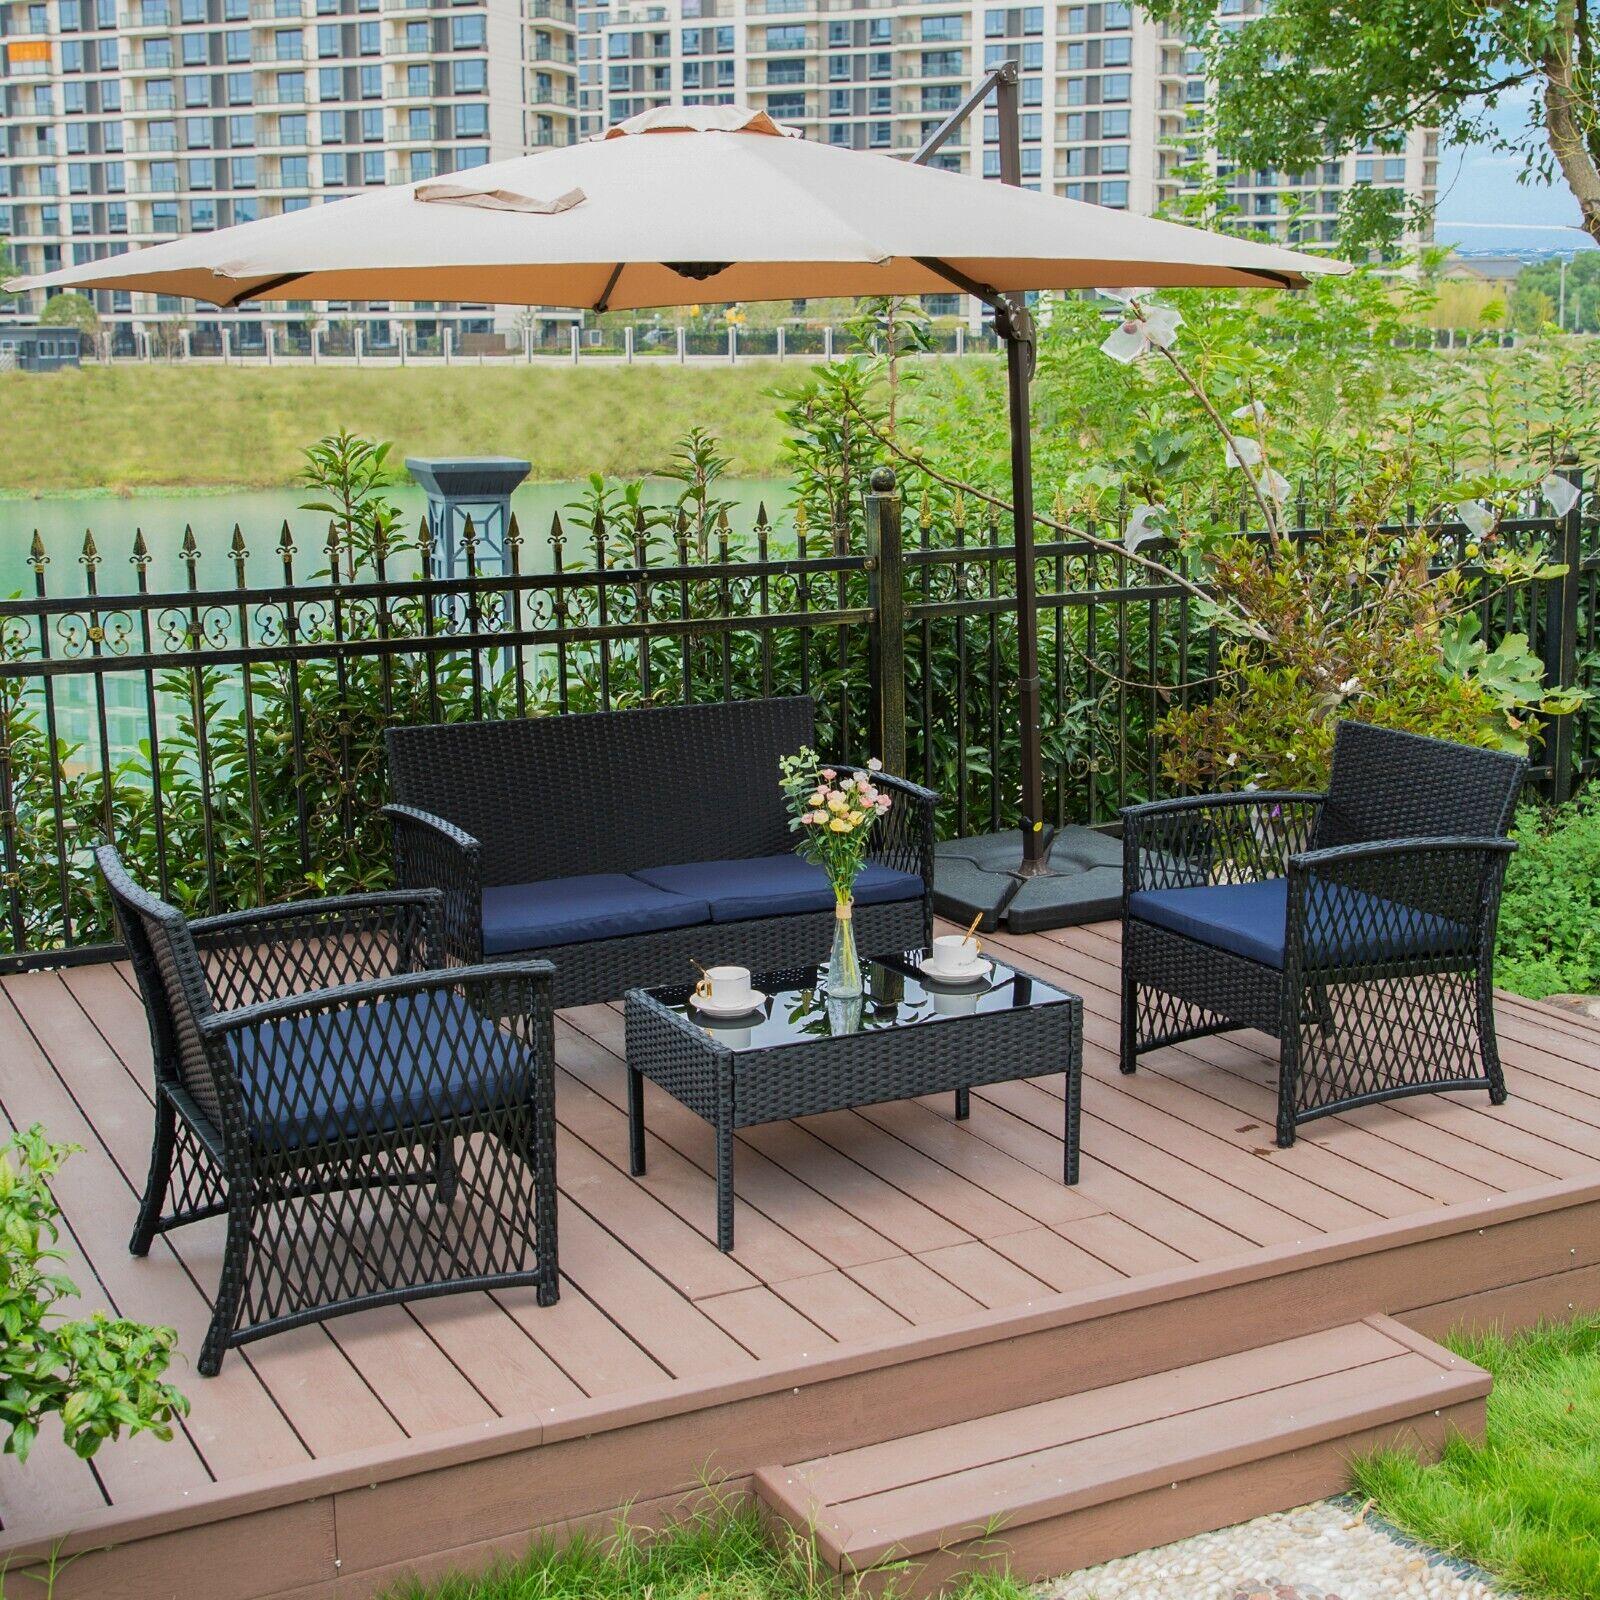 Garden Furniture - 4PC Furniture Wicker Rattan Patio Outdoor Conversation Sofa Set Garden Table